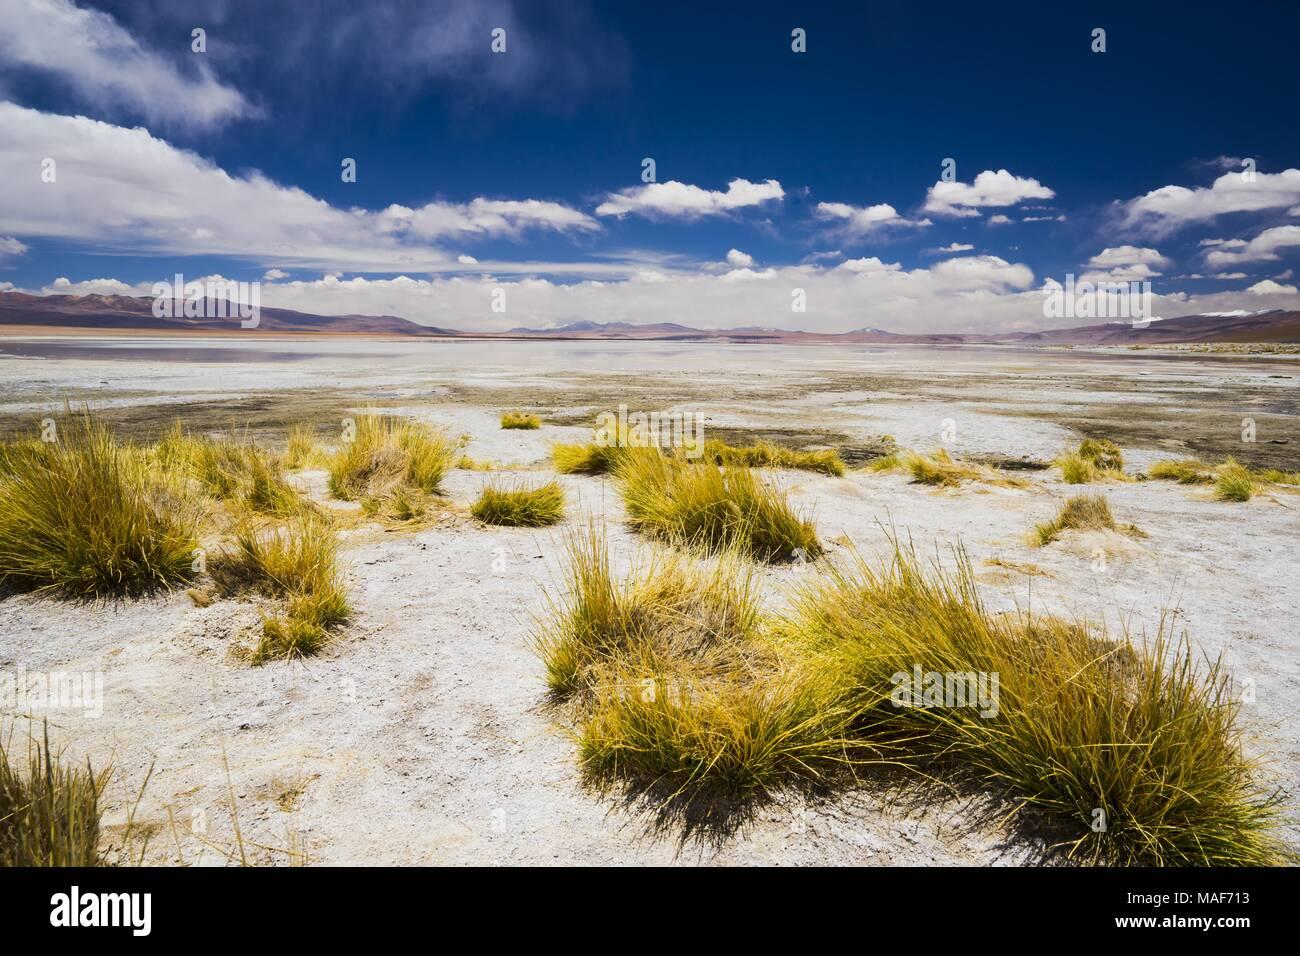 Suedamerika, Bolivien, Potosi, Sol de Mañana - Stock Image